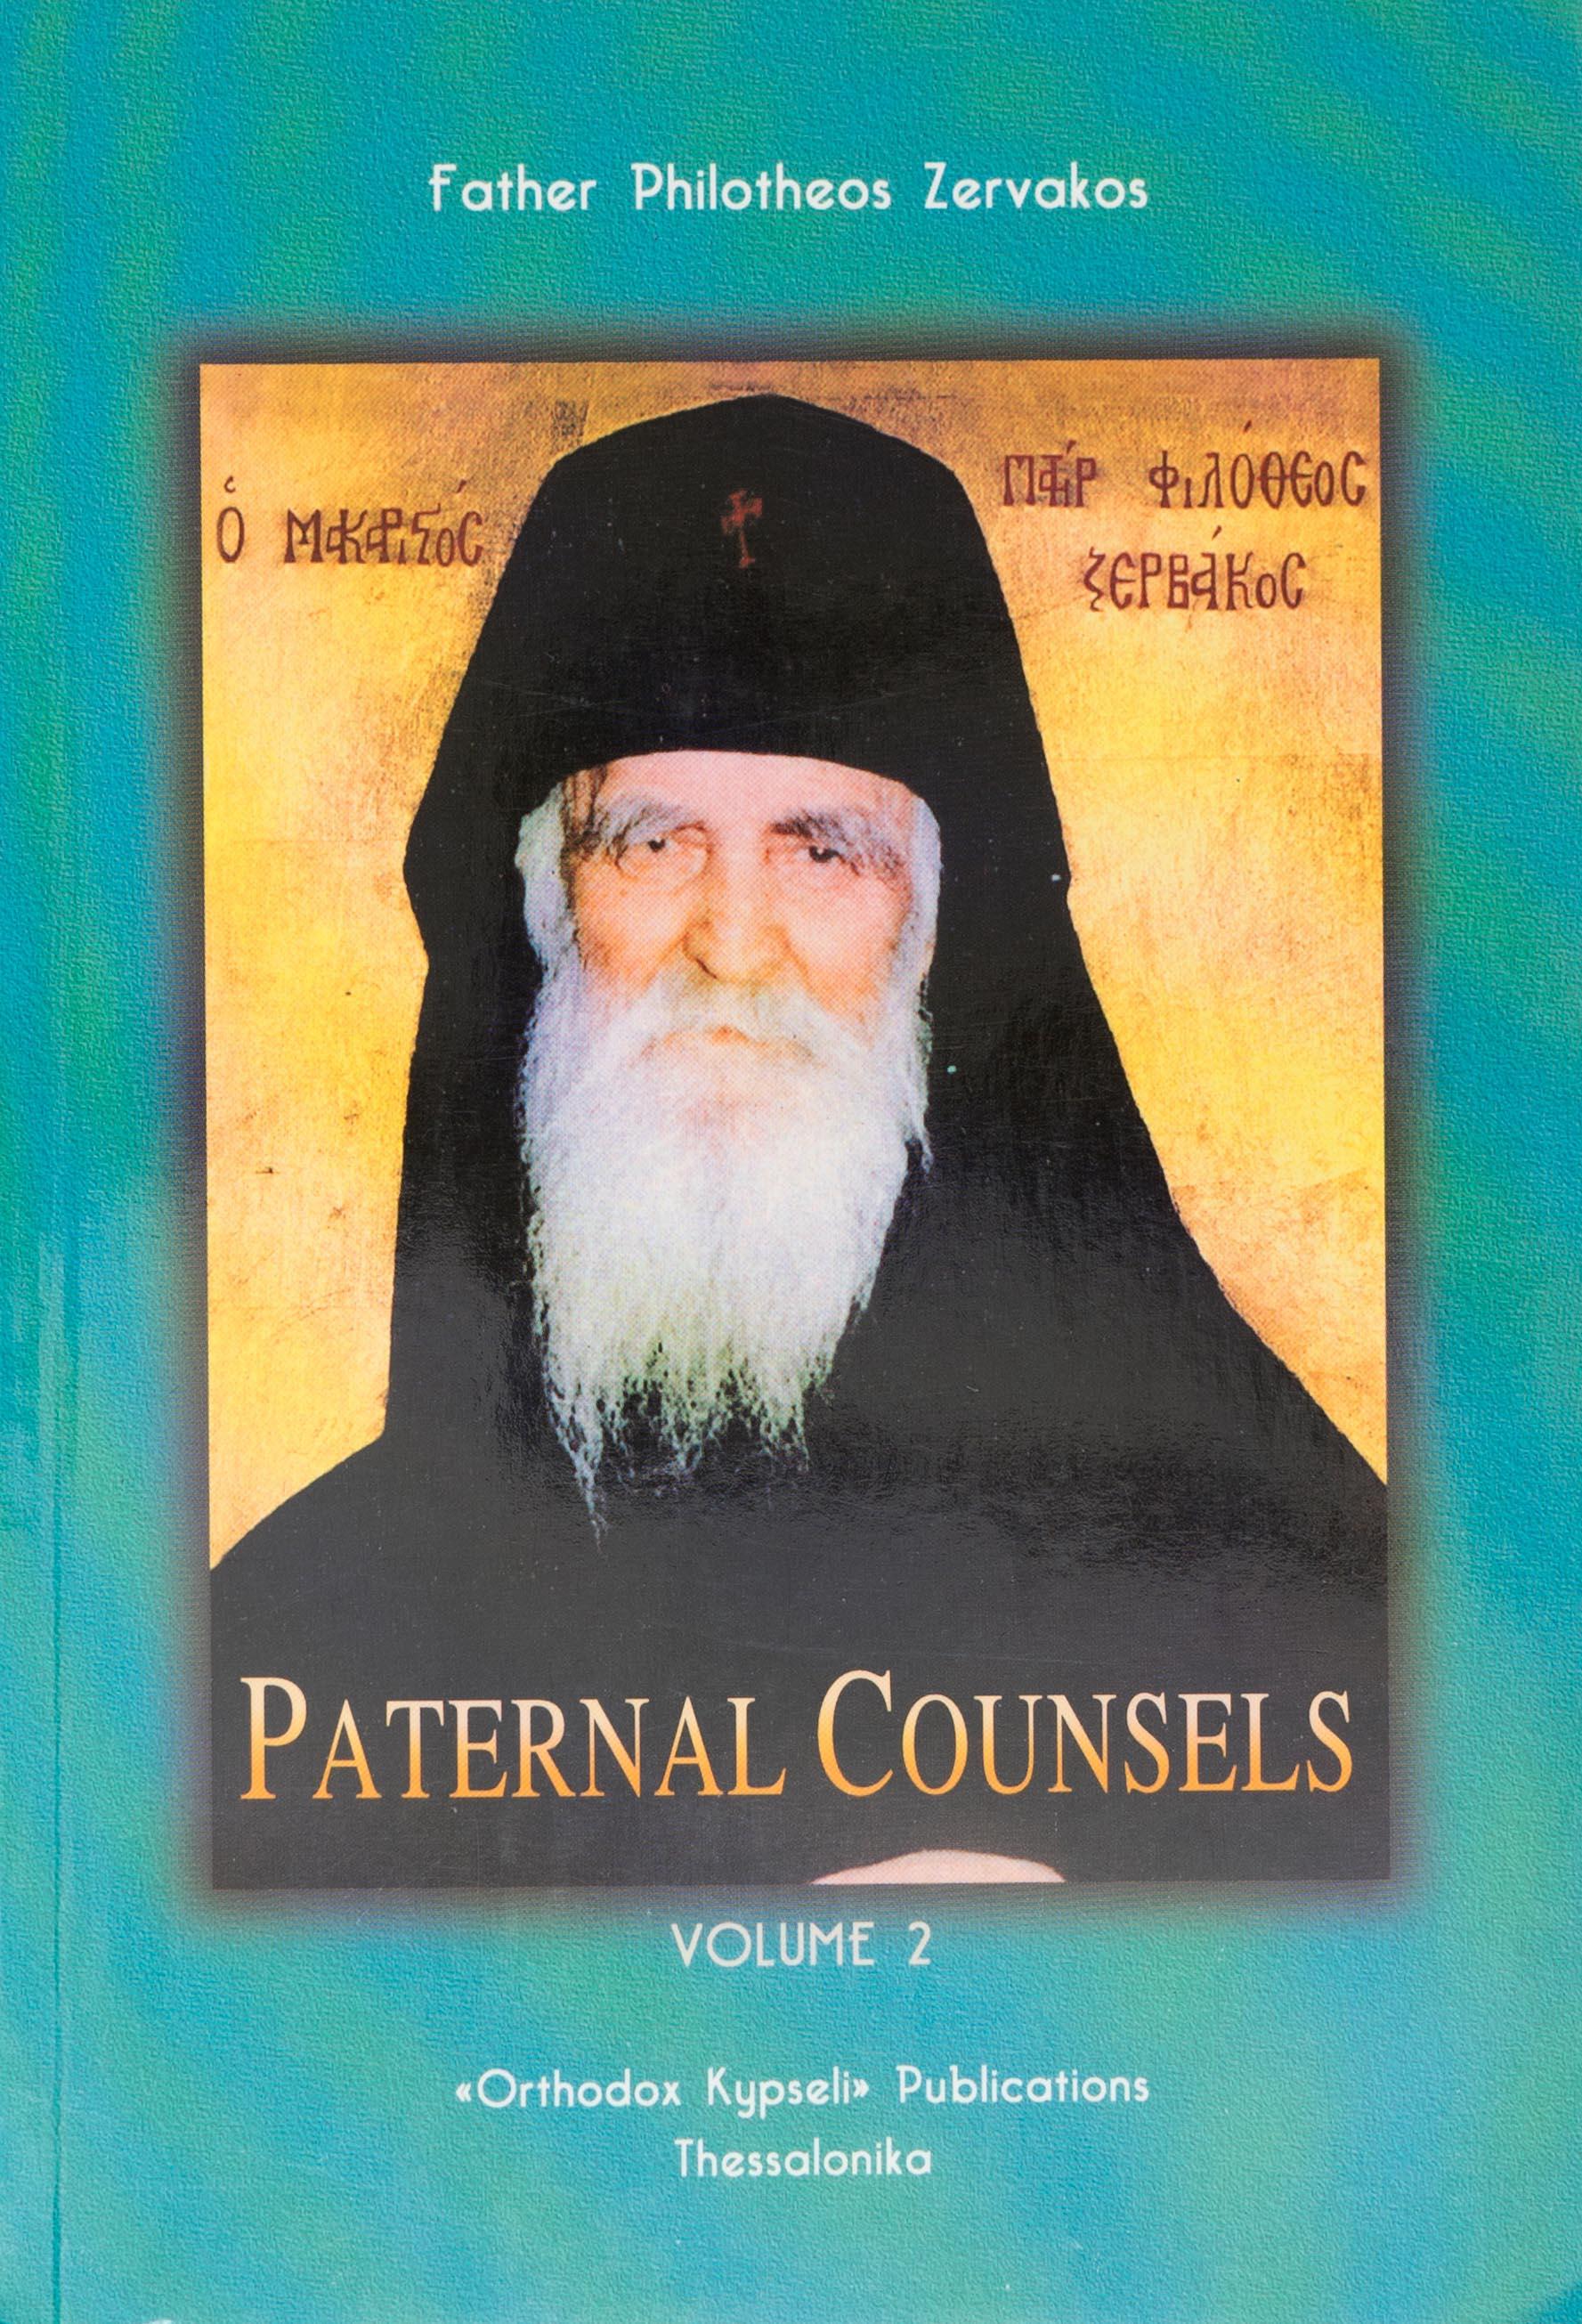 Paternal Counsels Vol. 2 Father Philotheos Zervakos